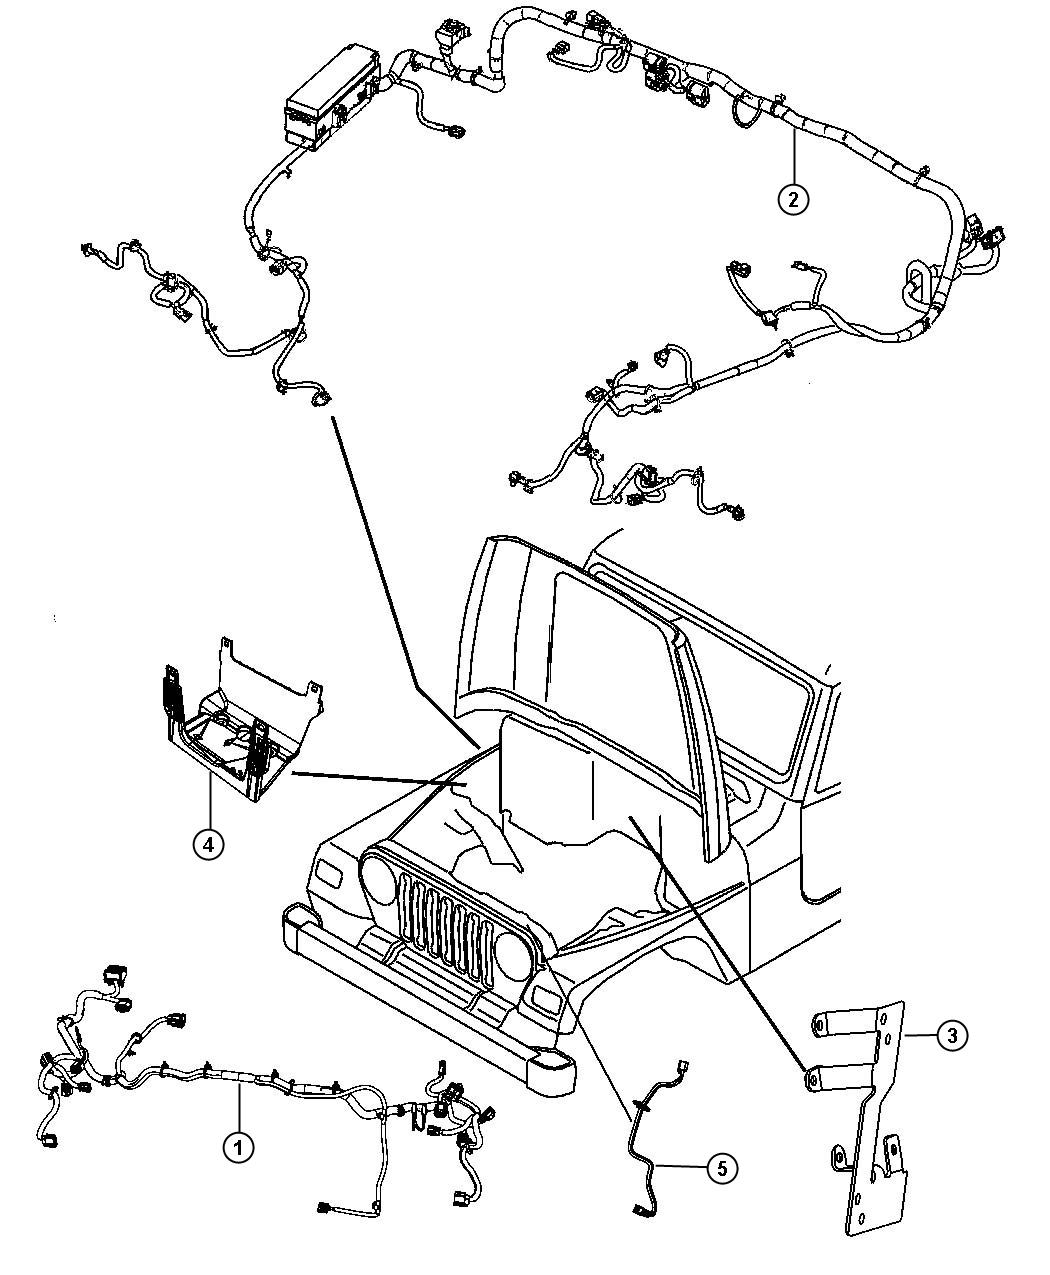 jk headlamp wiring diagram